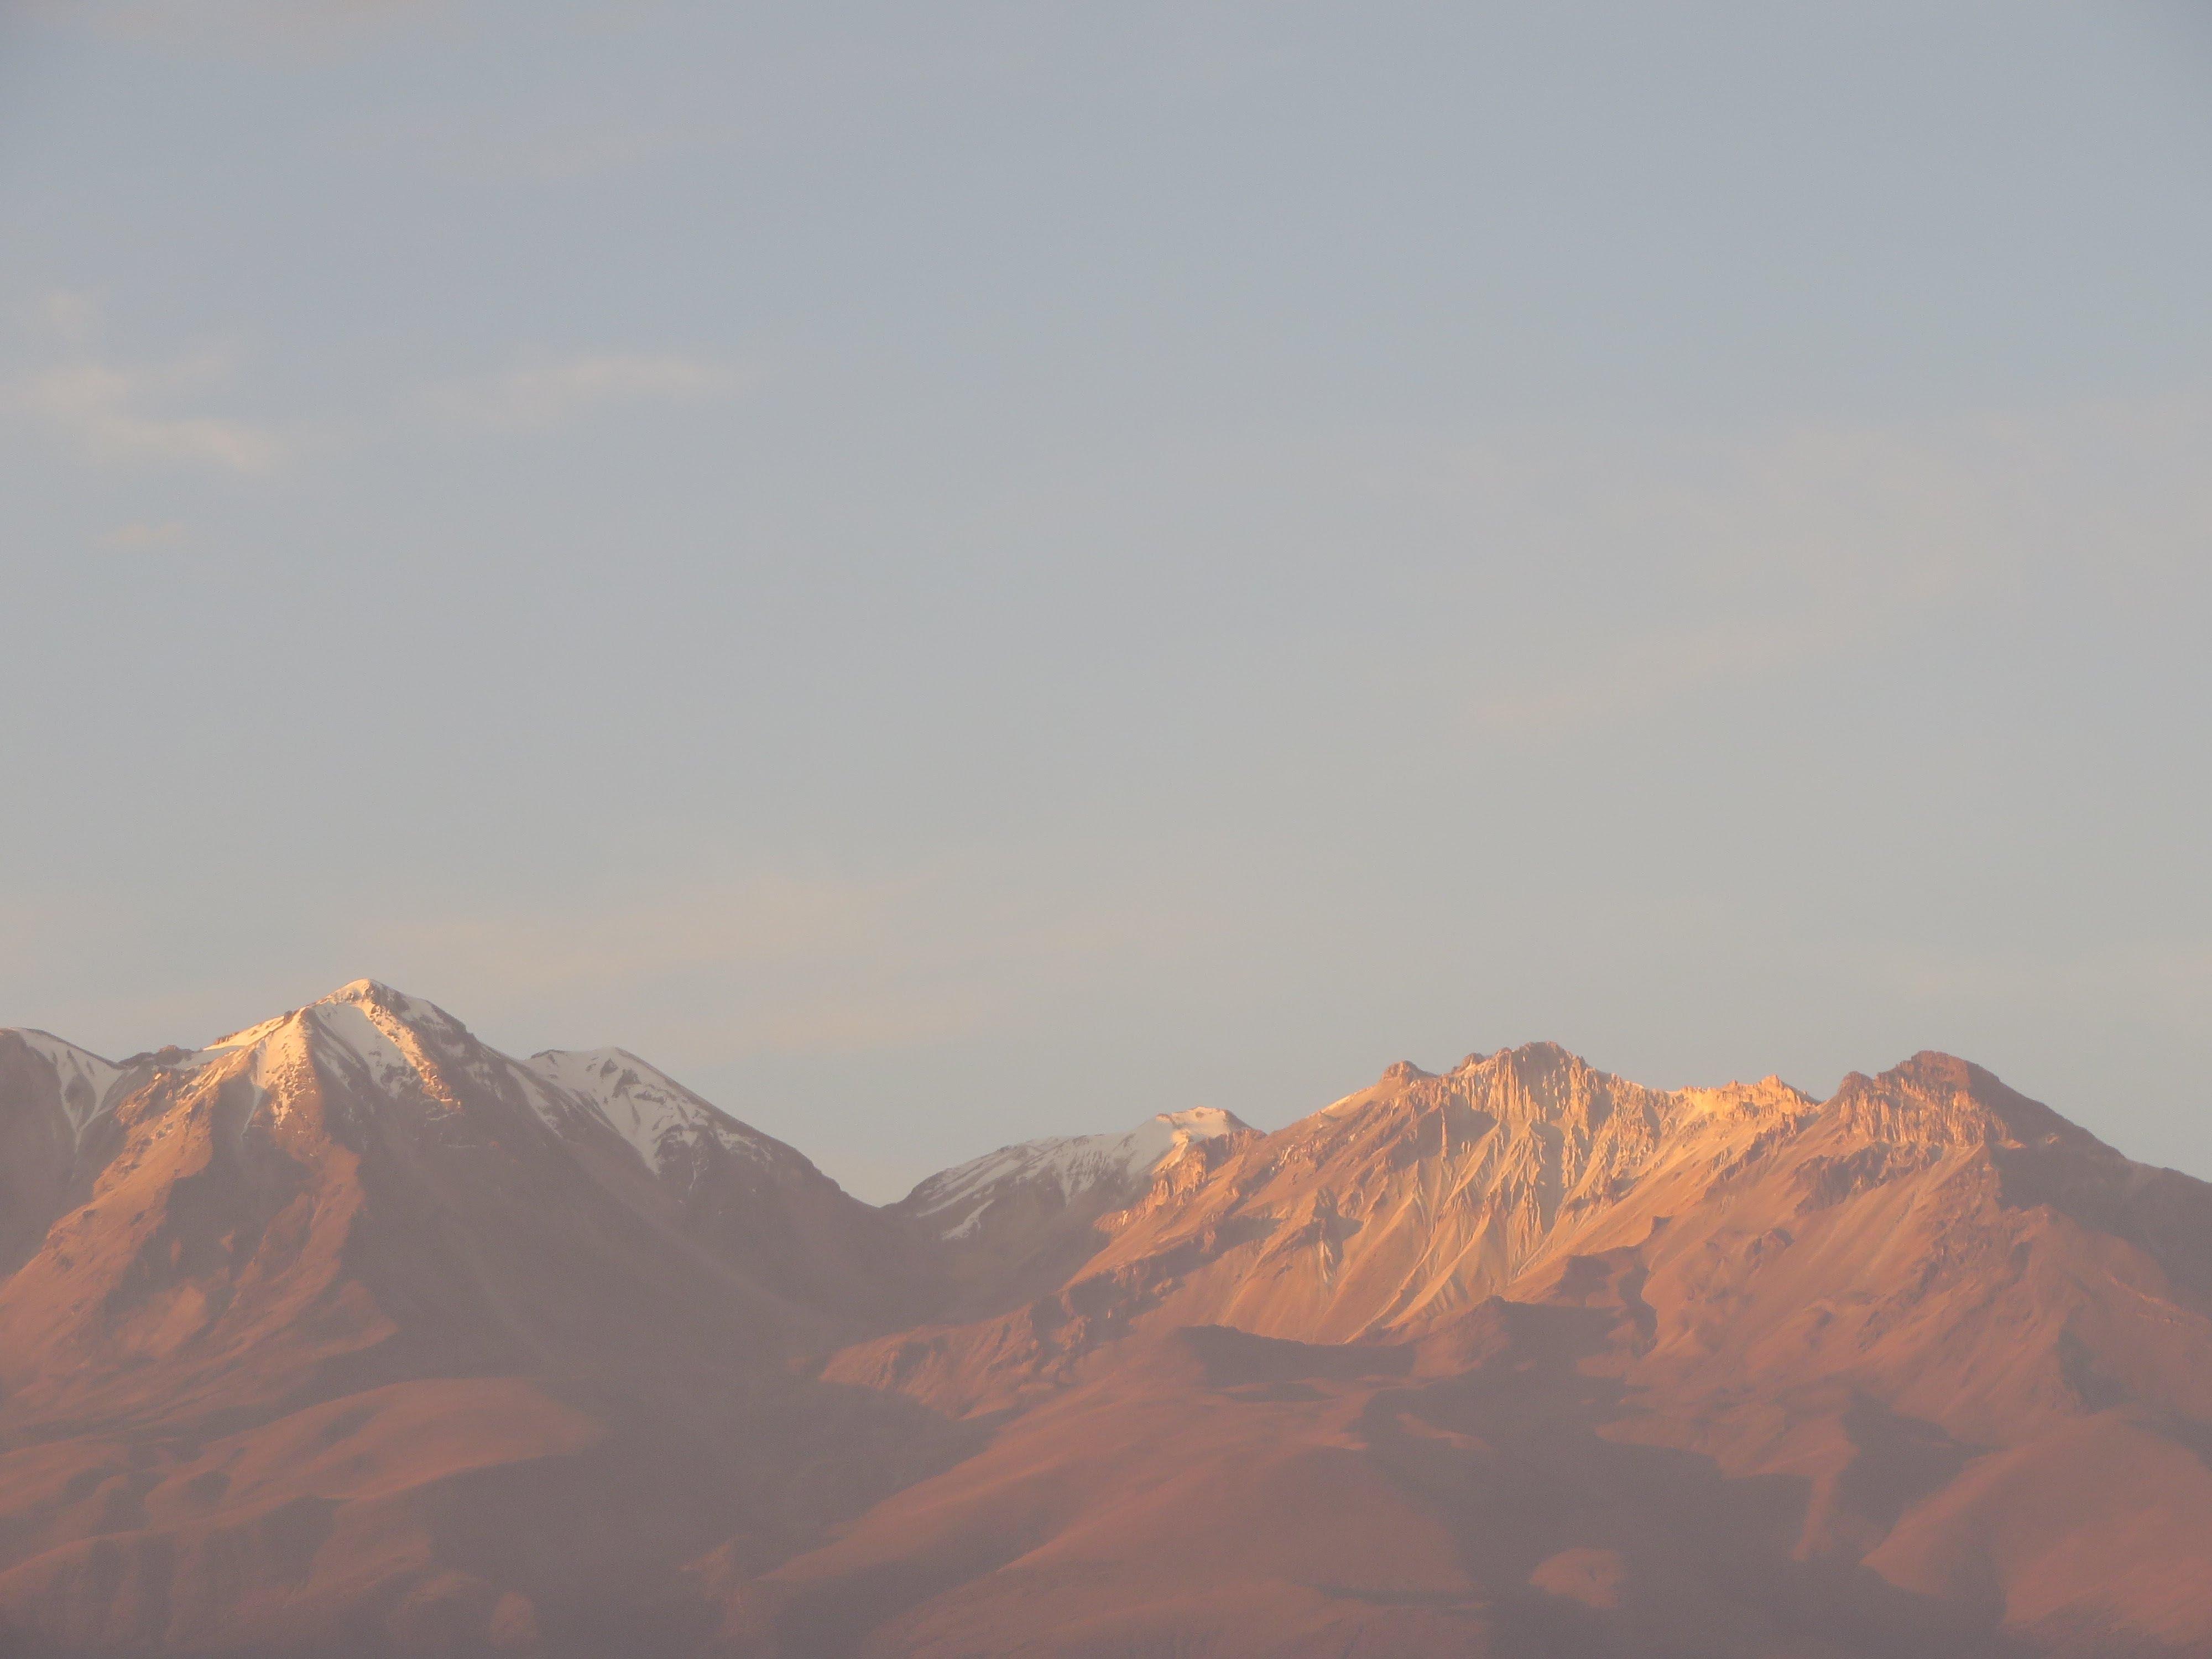 www.yuyanapaq.com